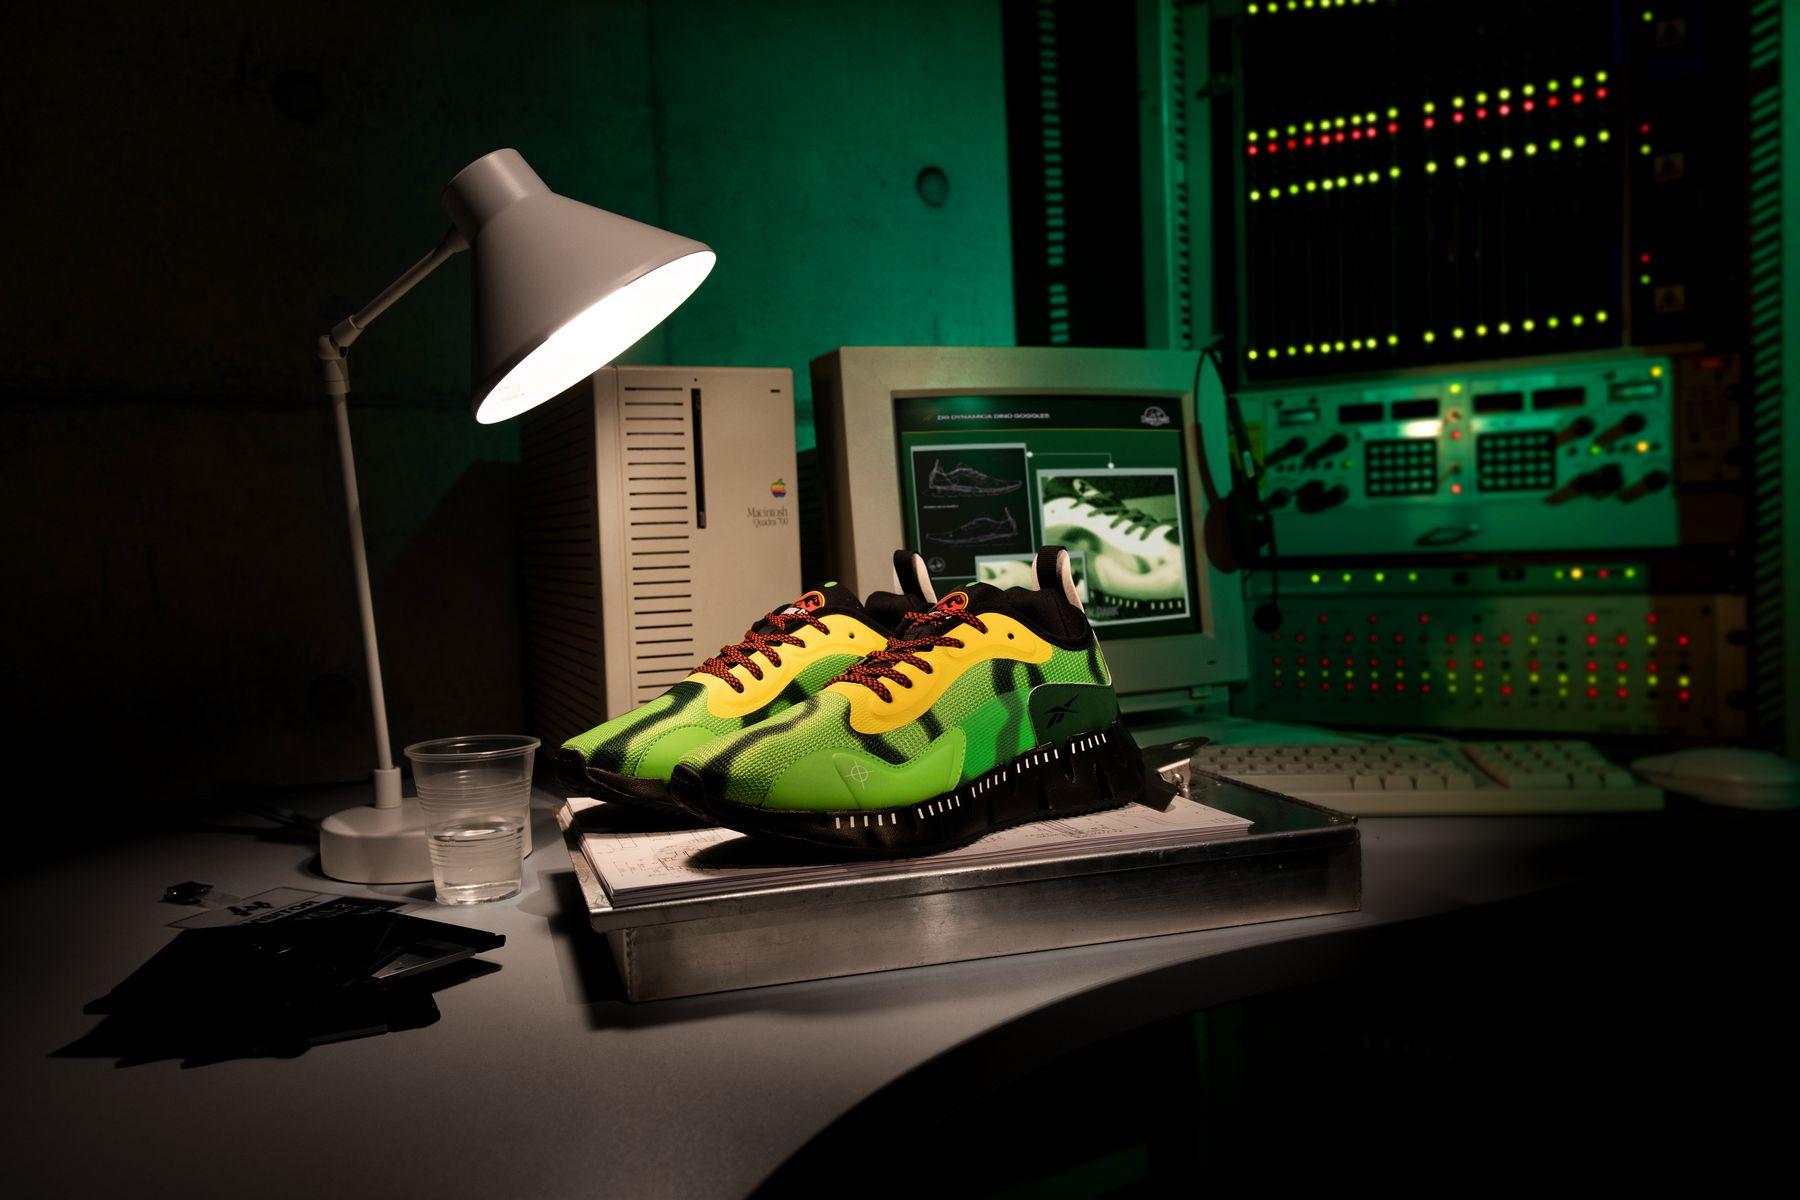 Reebok x Jurassic Park - Zig Dynamica GS/PS- sushi green/stinger yellow/black - GY0581/GX8144